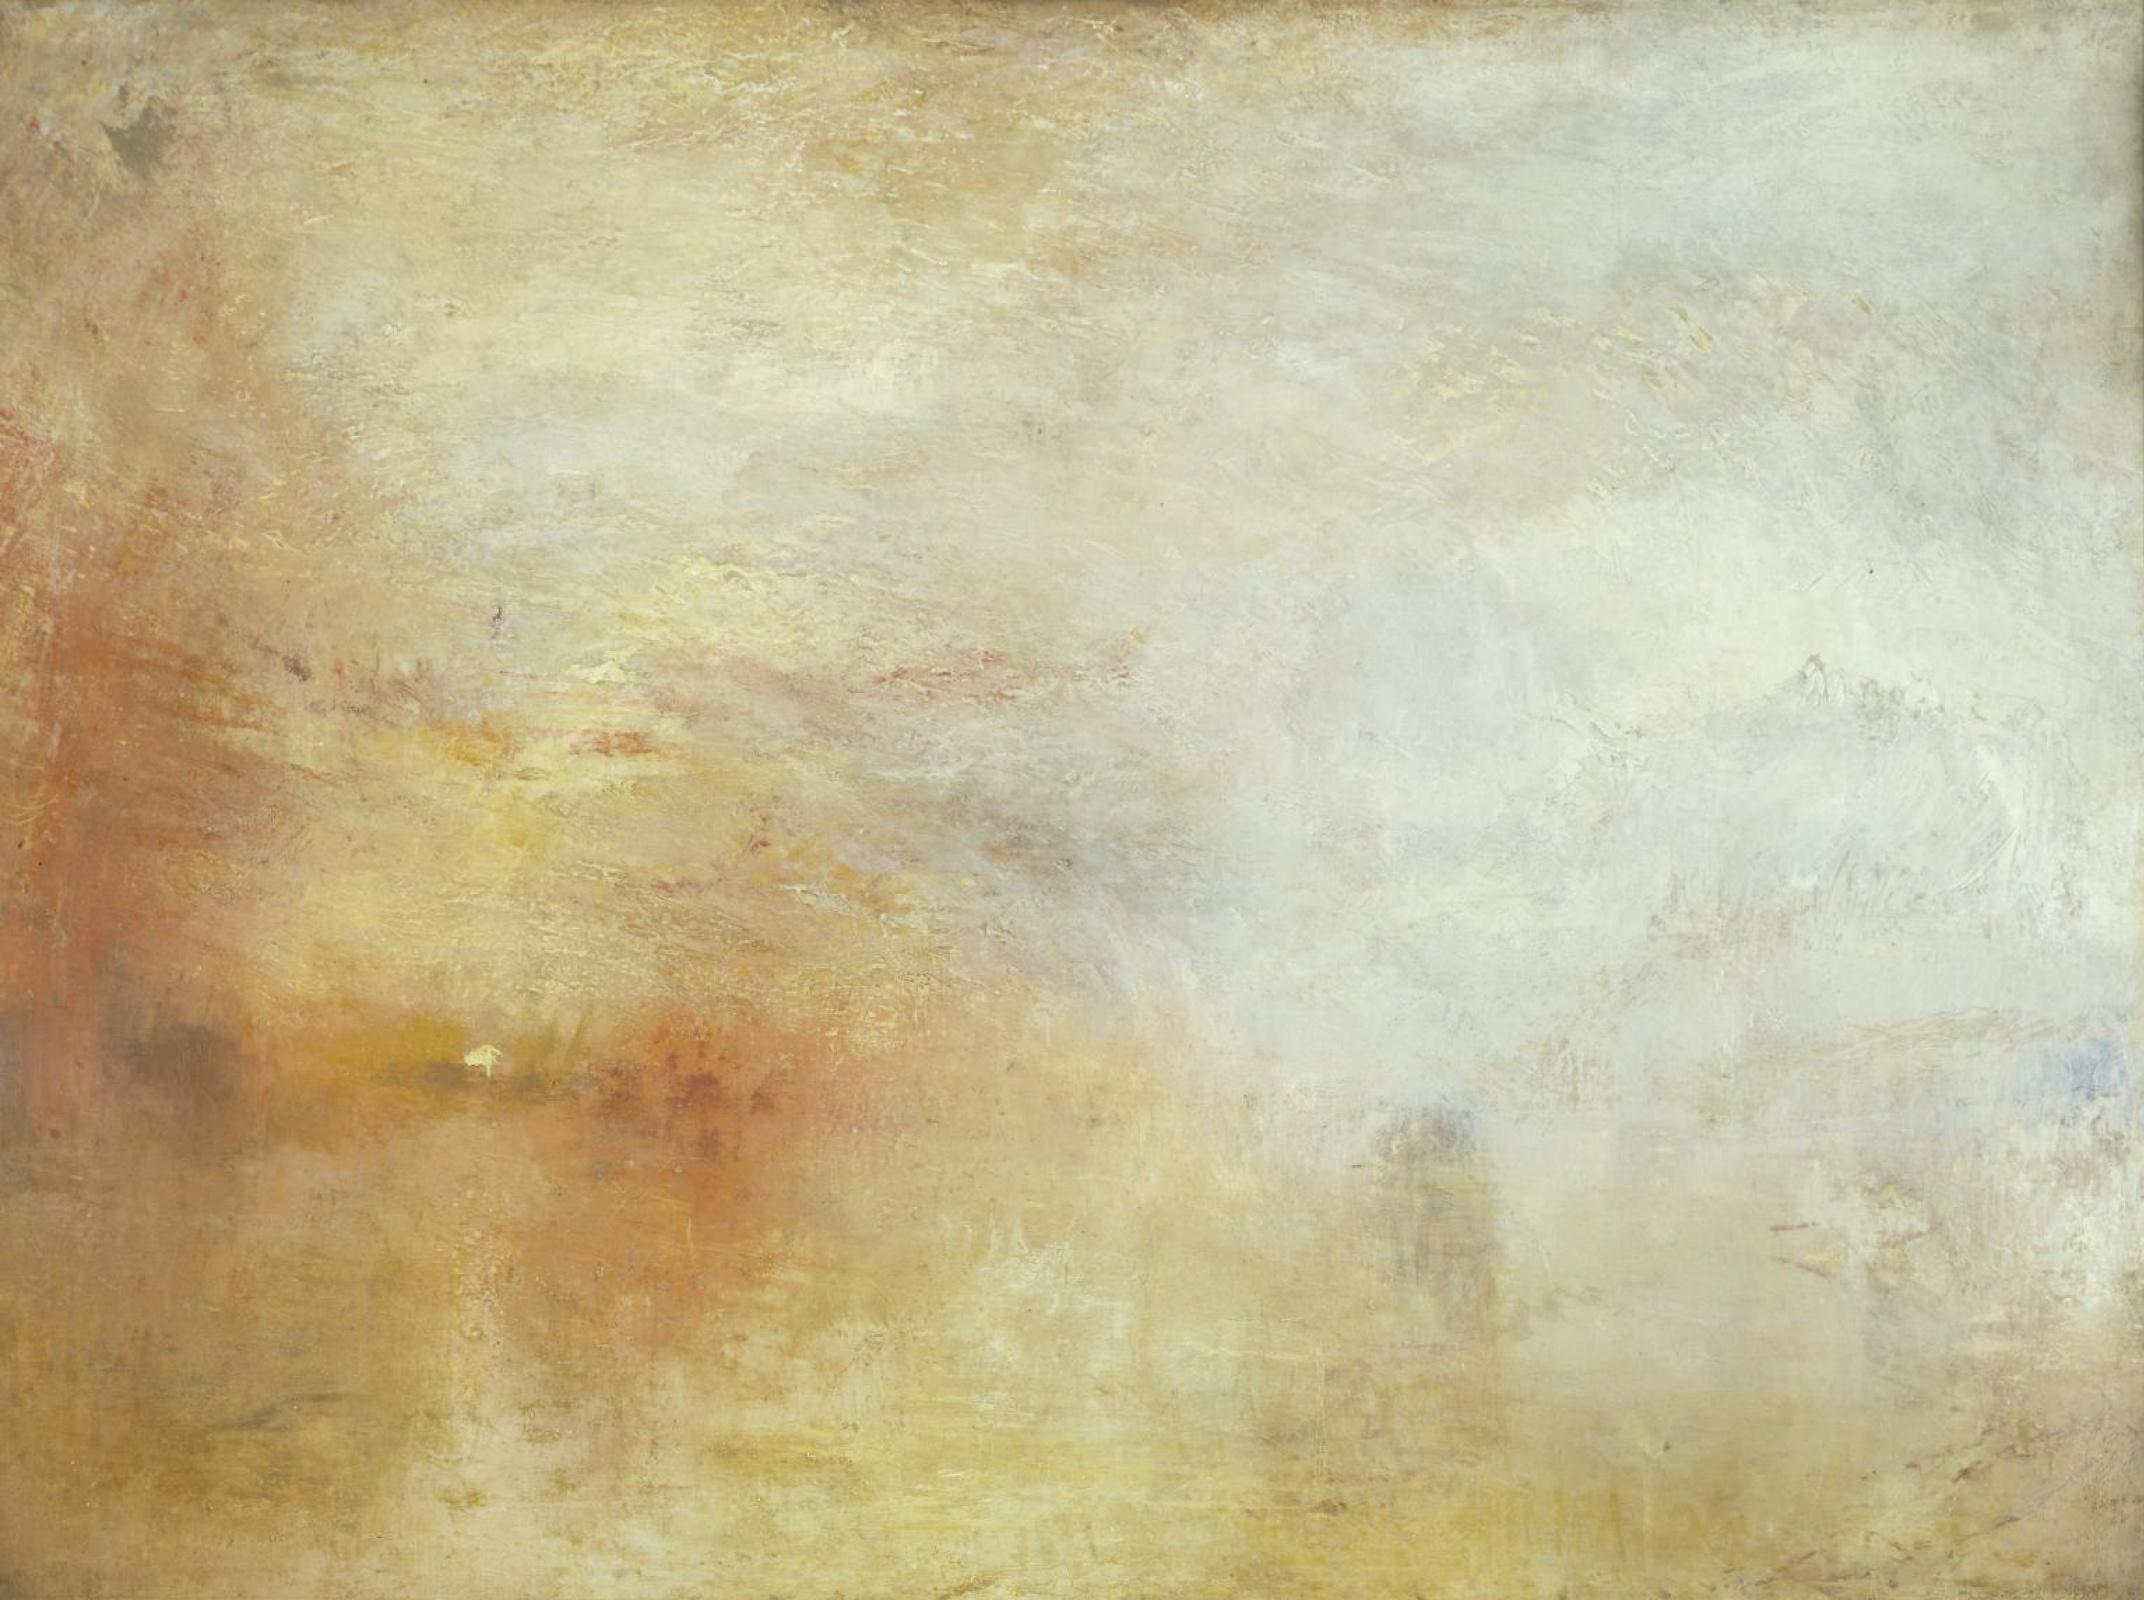 Джозеф Мэллорд Уильям Тёрнер. Закат над озером